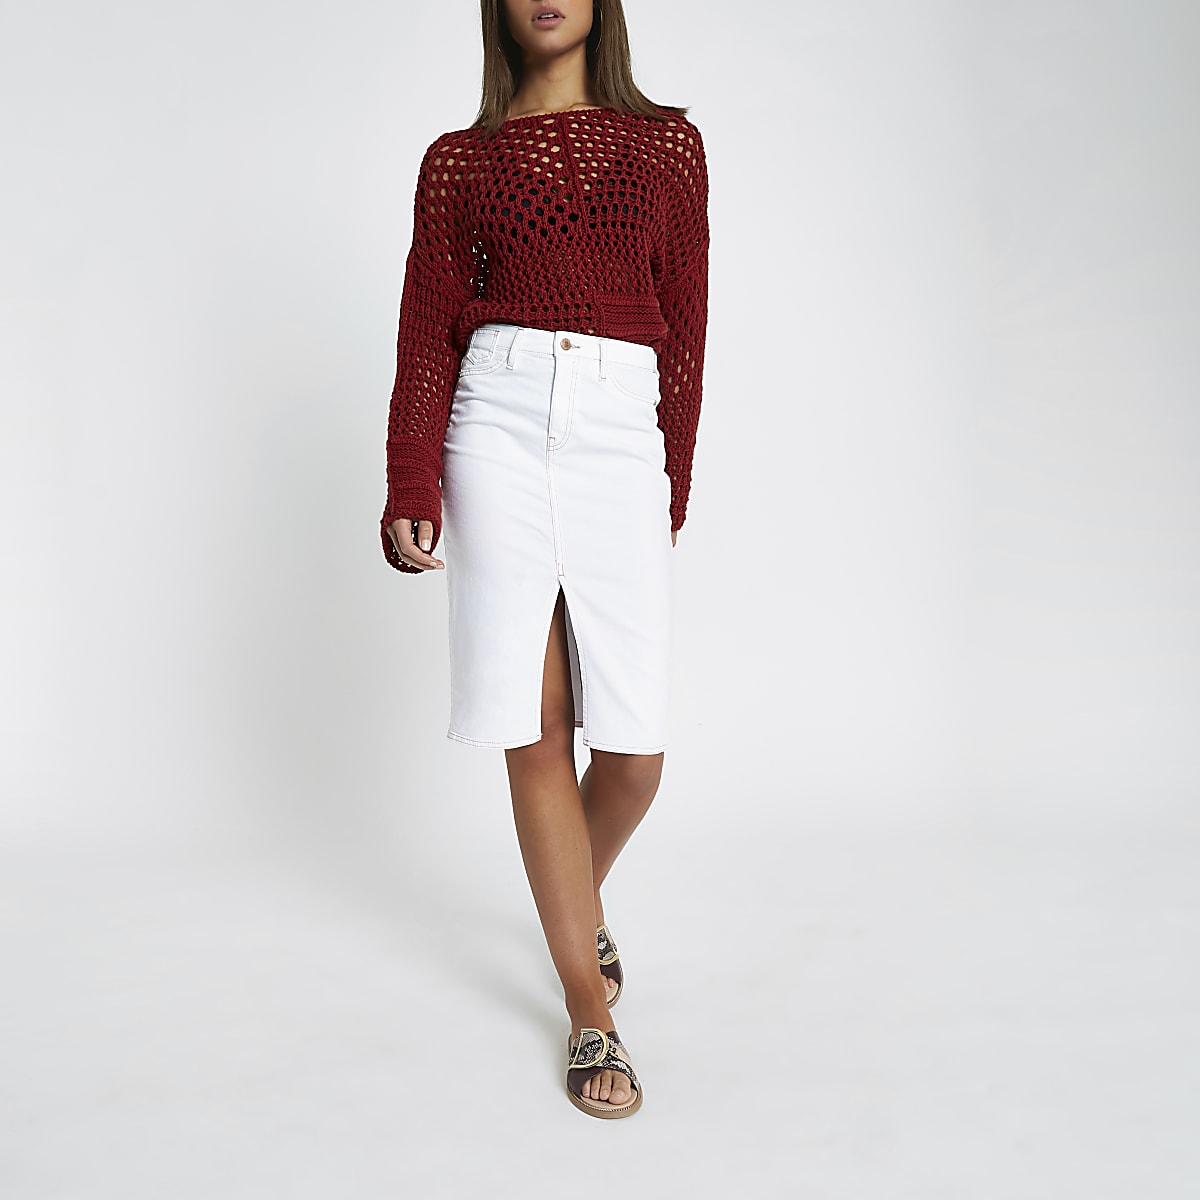 5701abffe4e2bb White contrast stitch denim pencil skirt